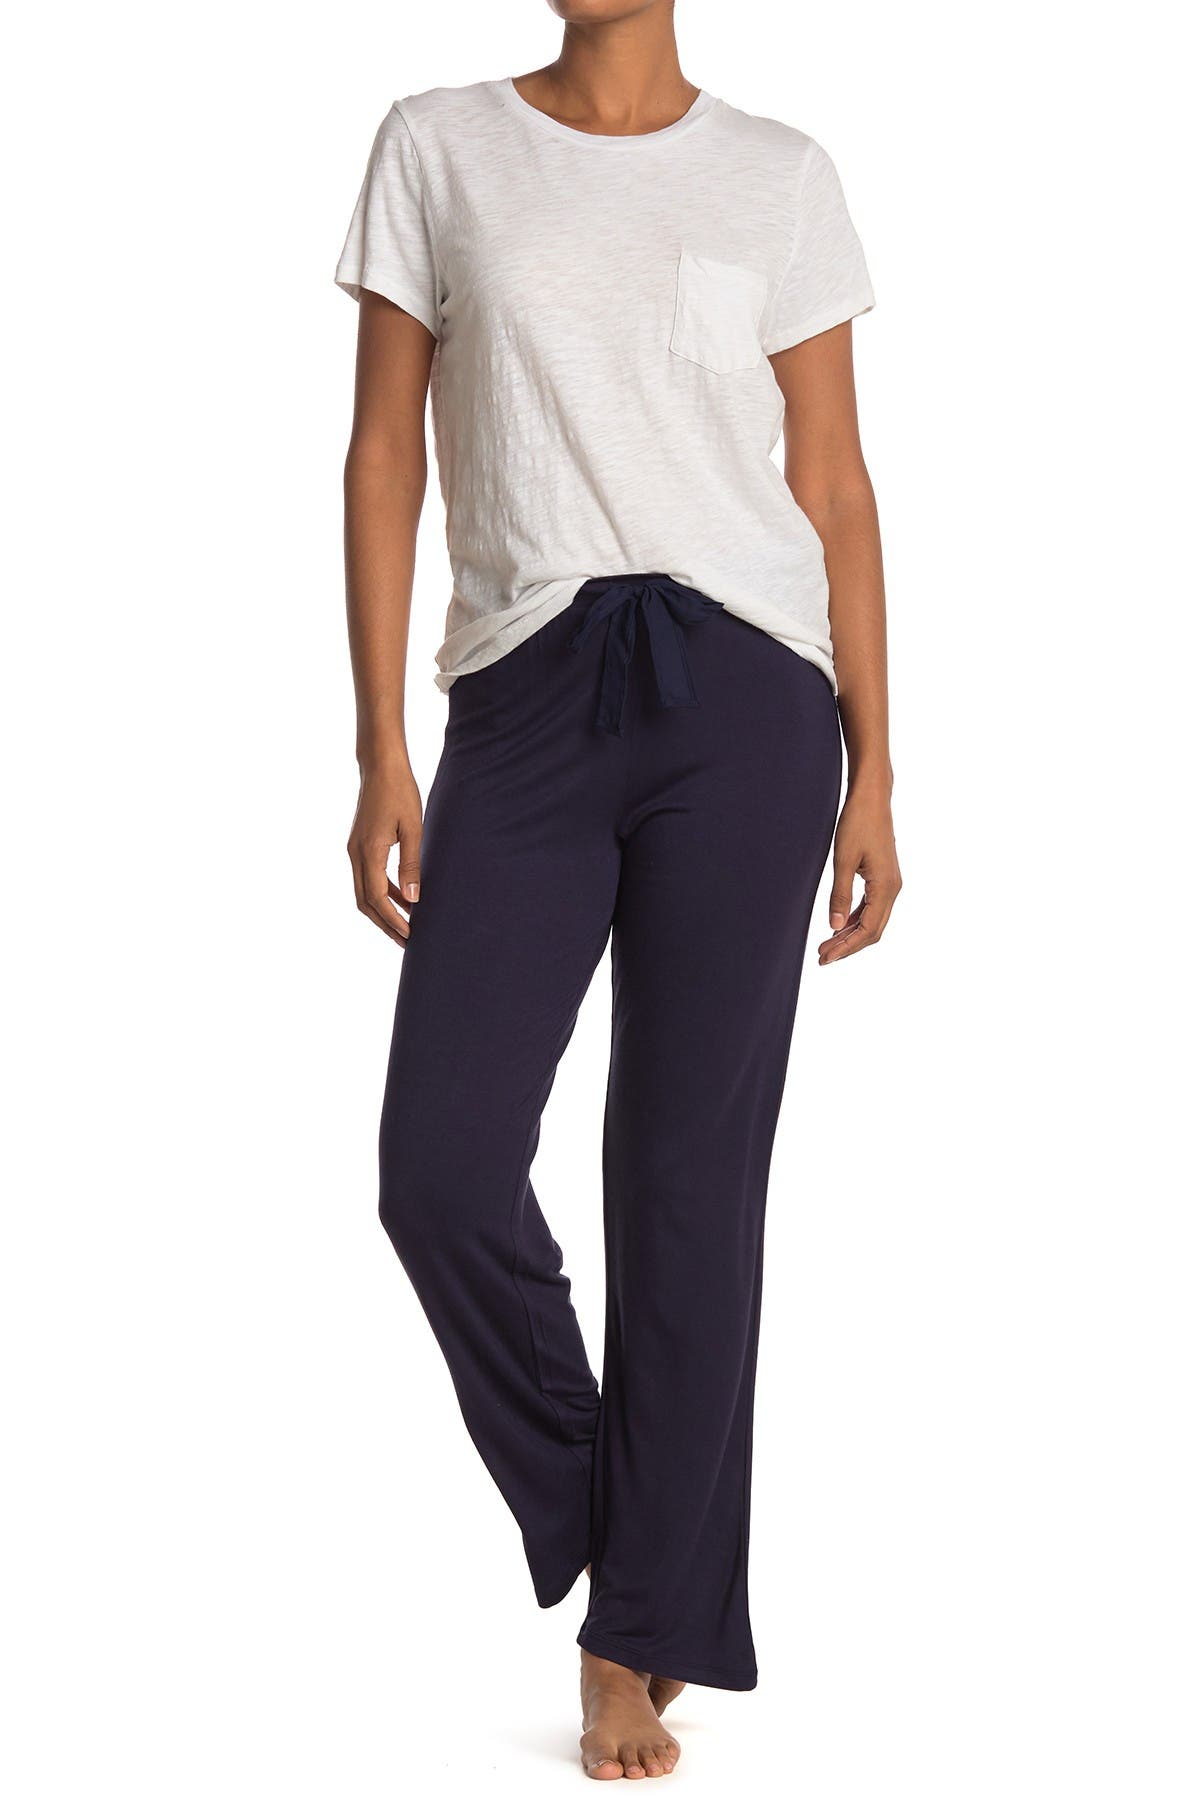 Image of DKNY Lounge Pants